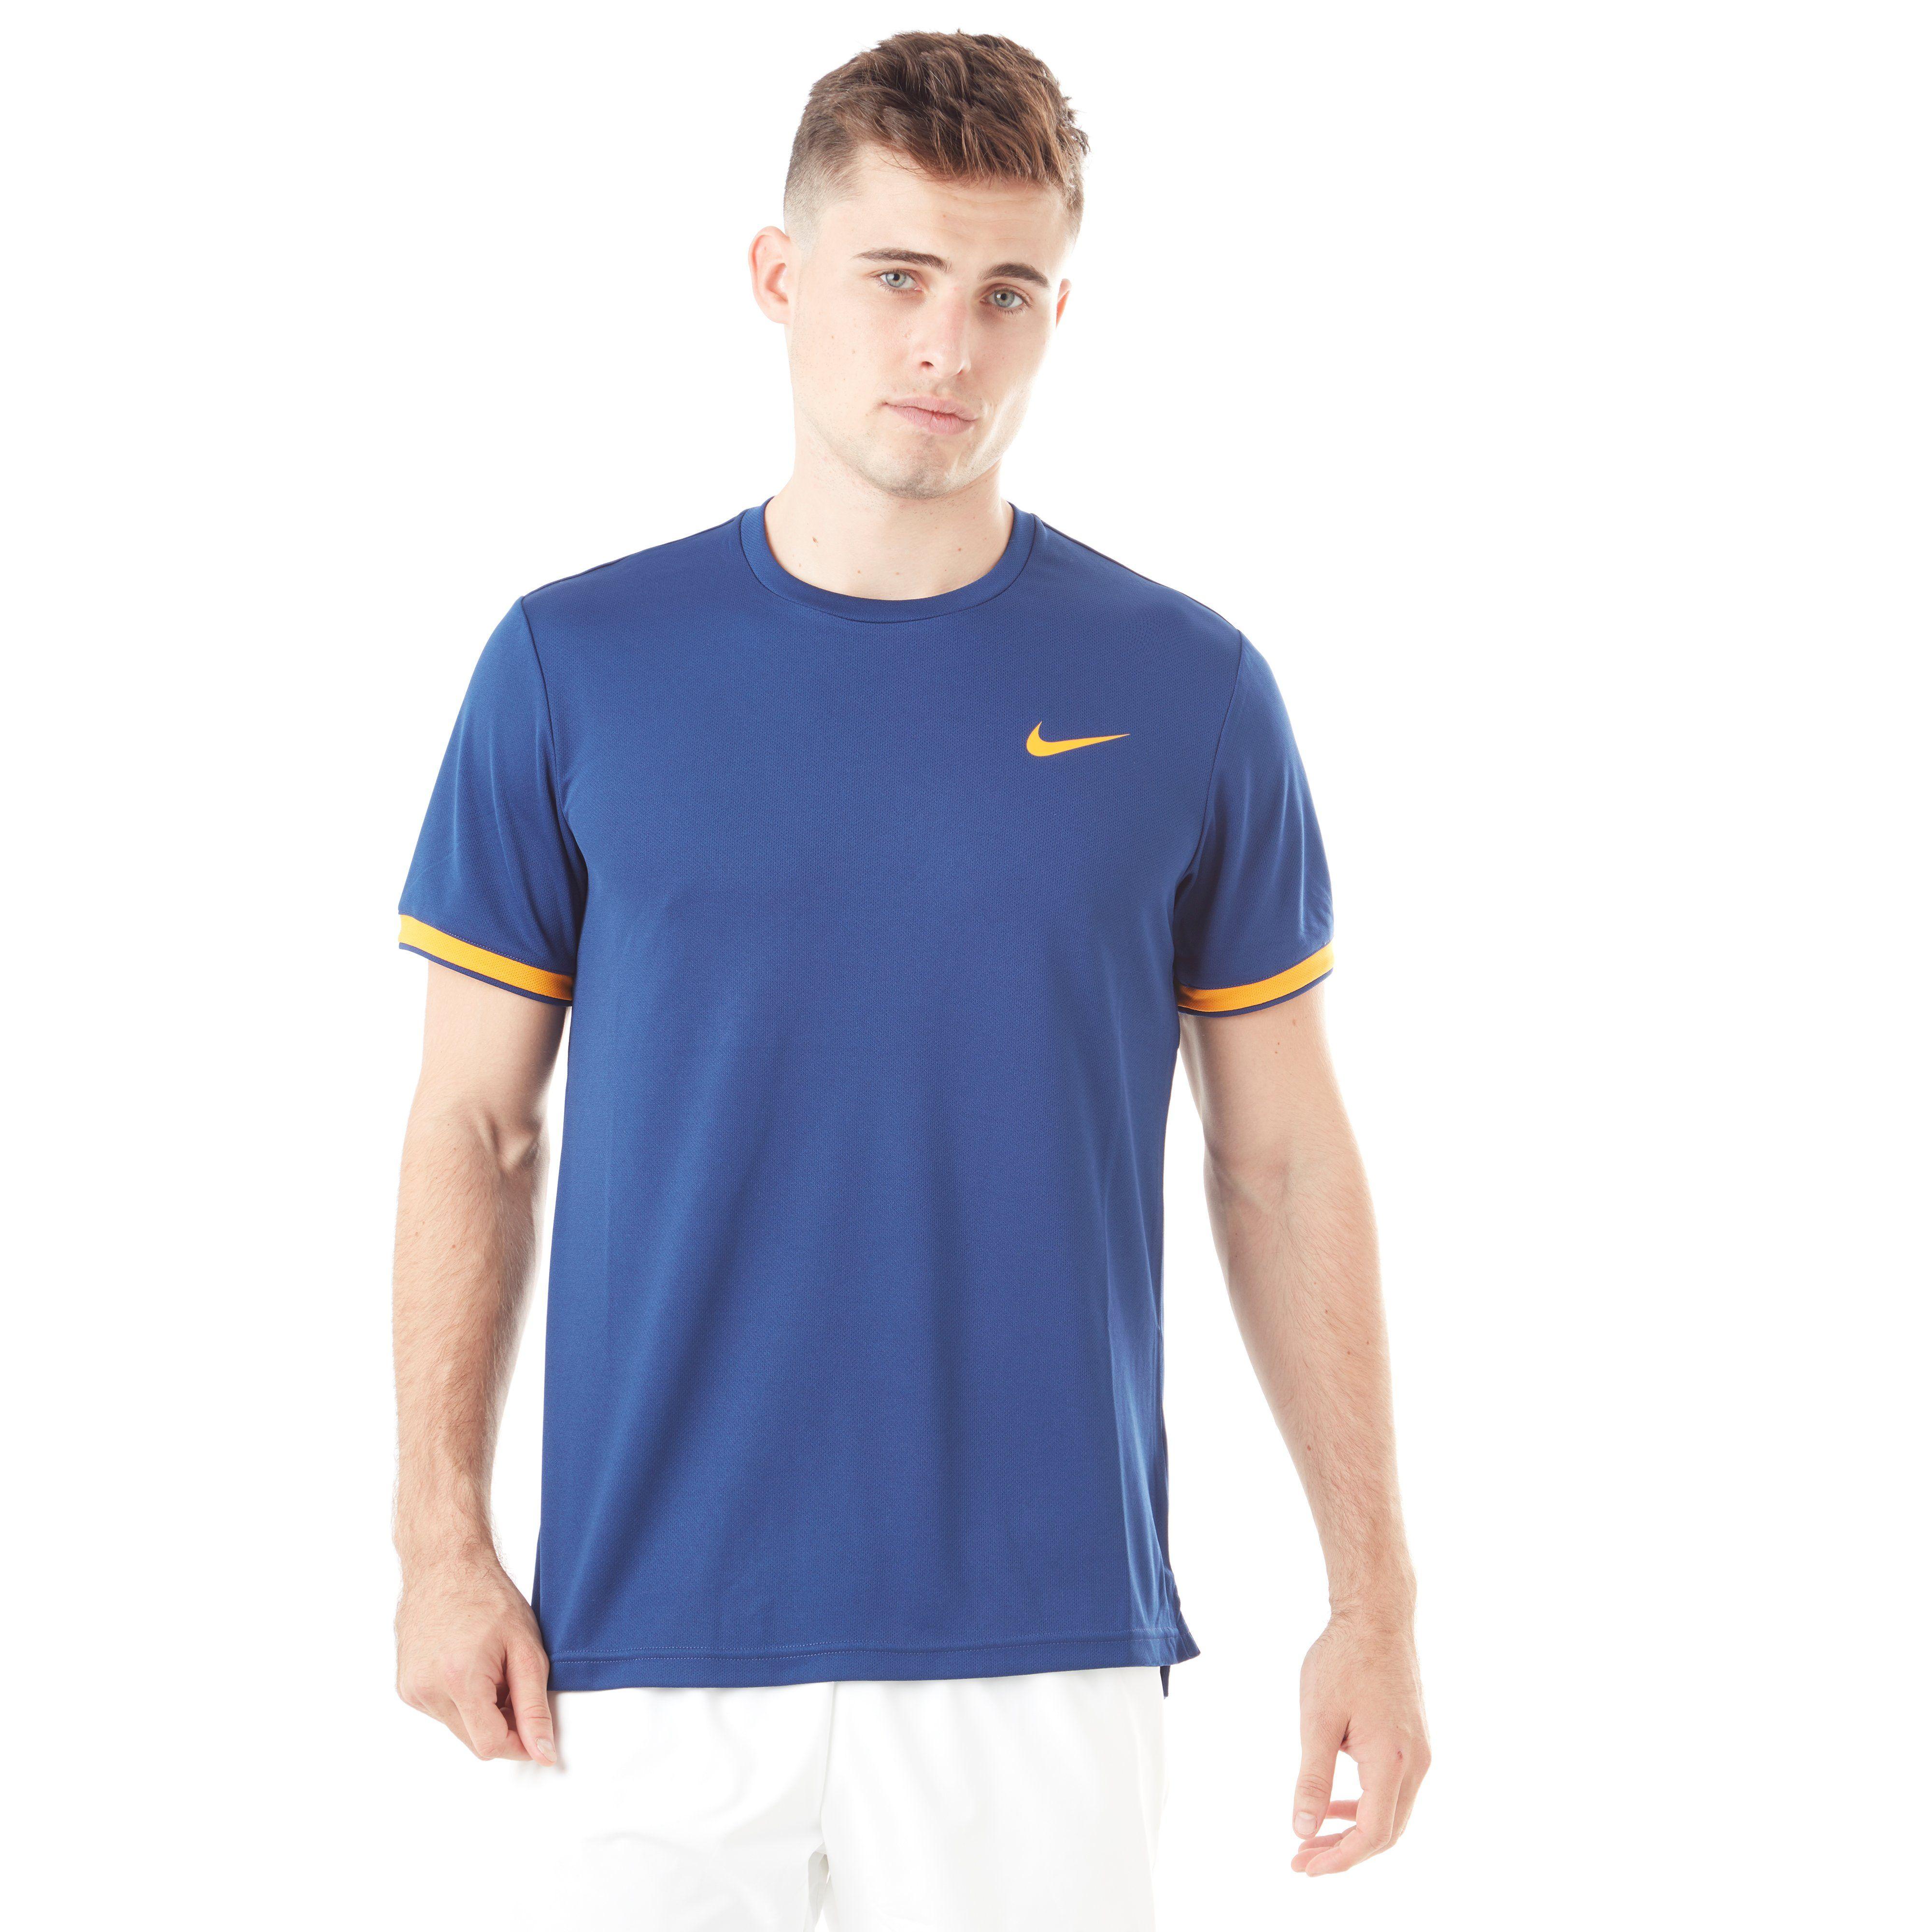 Nike Court Dry Short Sleeve Men's Tennis T-Shirt